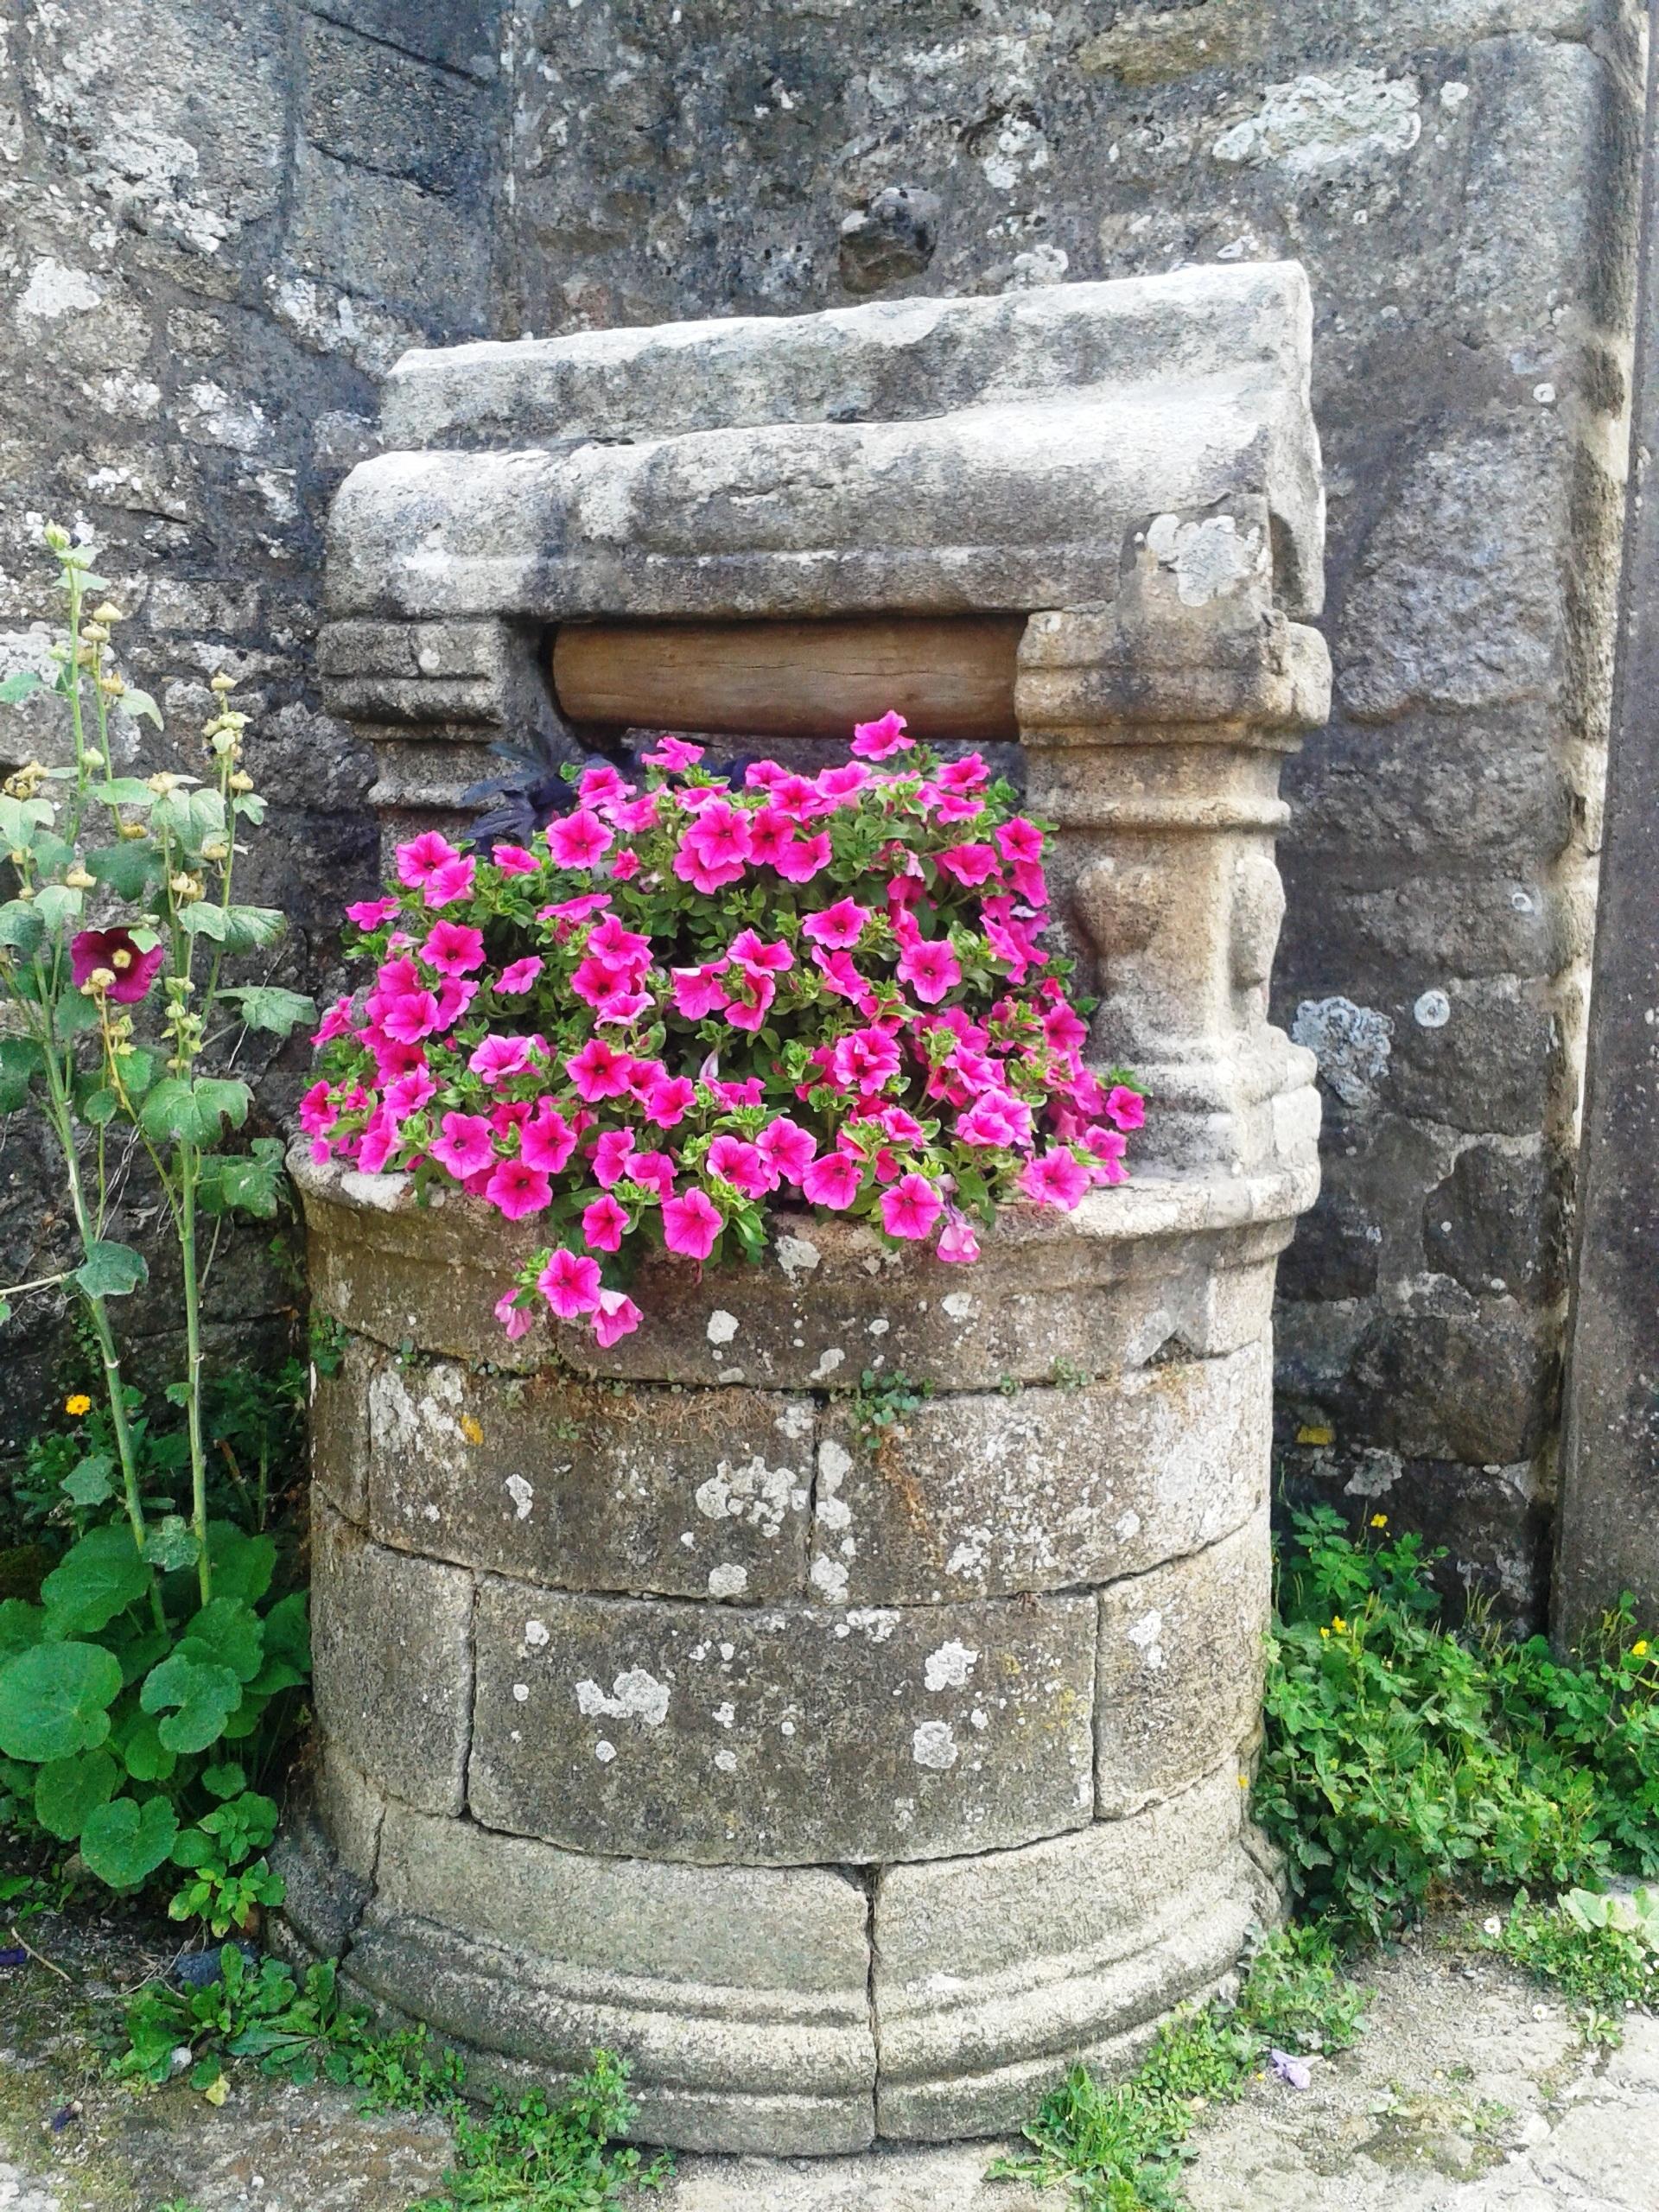 Fotos gratis flor cementerio jard n tumba memorial for Cementerio jardin